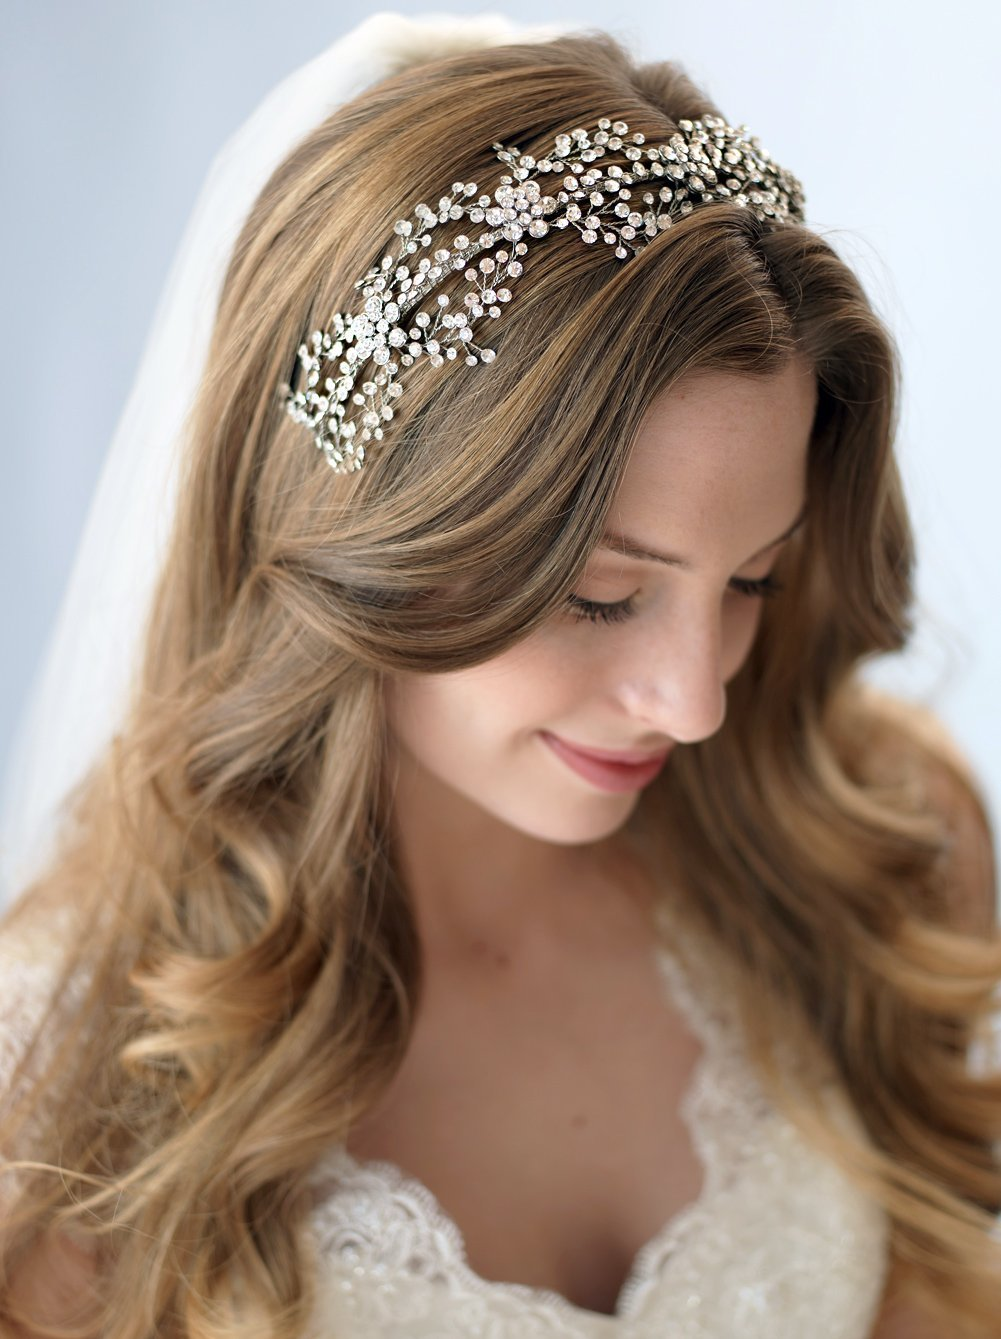 USABride Rhinestone Floral and Vine Bridal Headband Nature Inspired Wedding Headpiece 3228